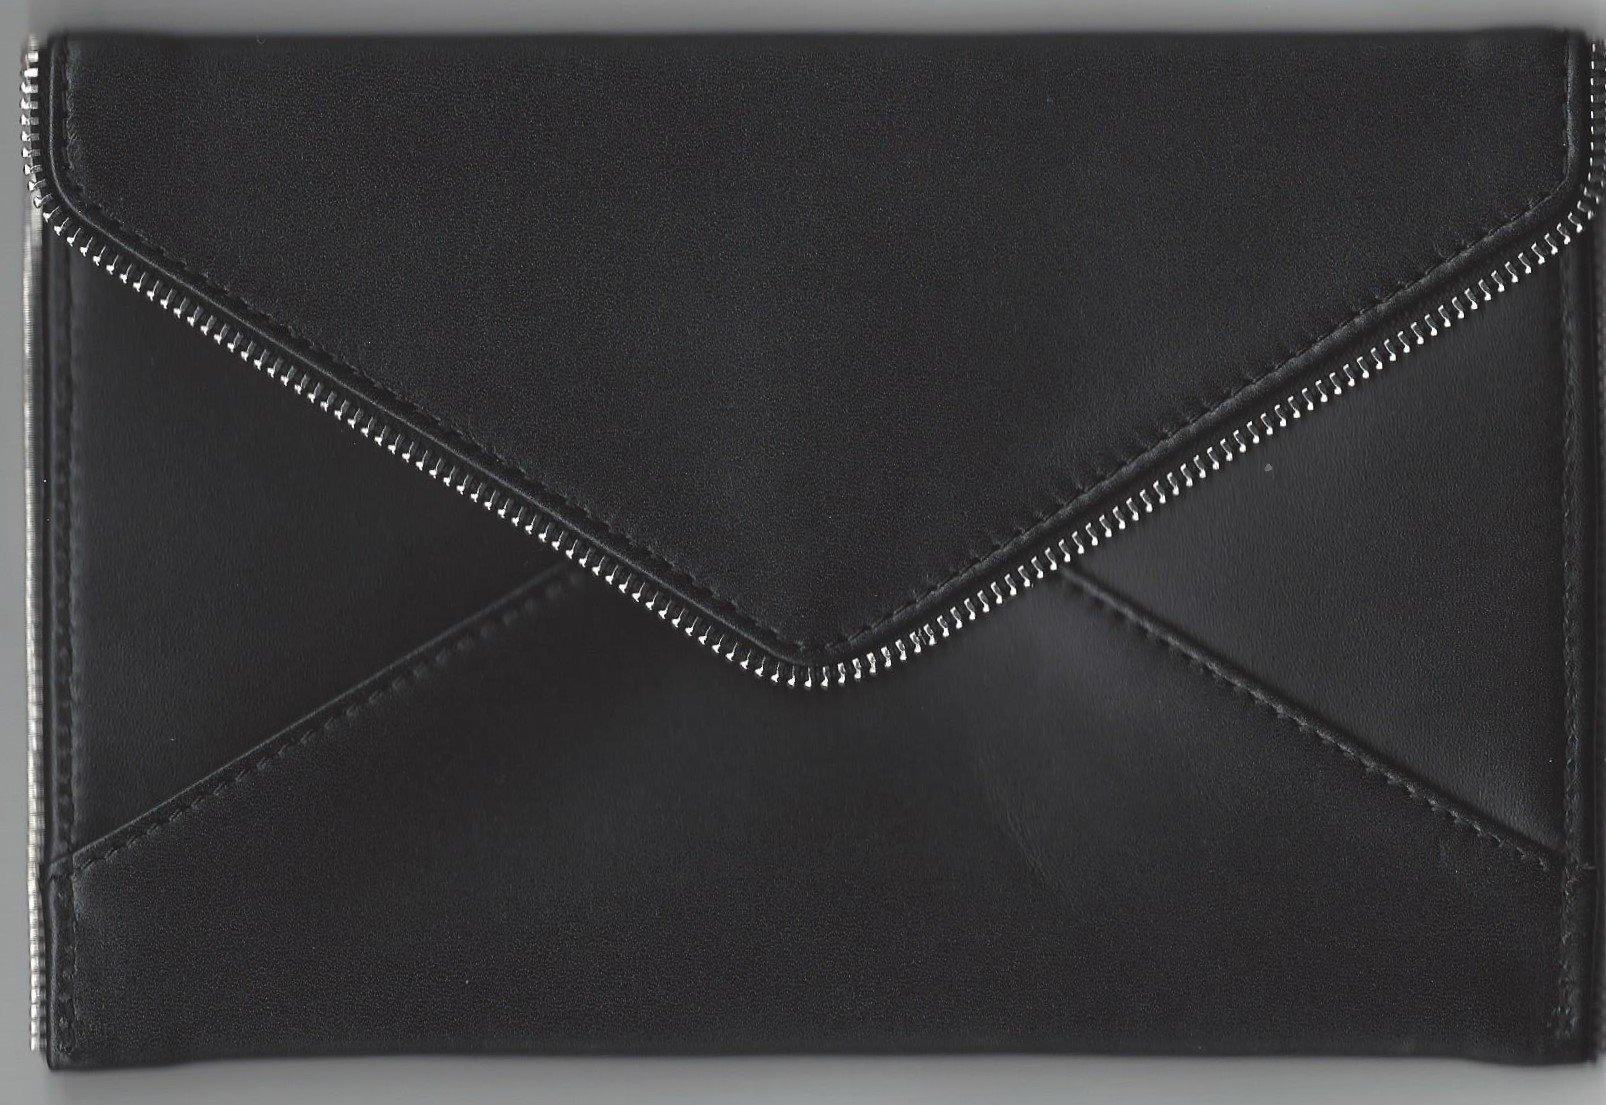 Flat Leather Clutch